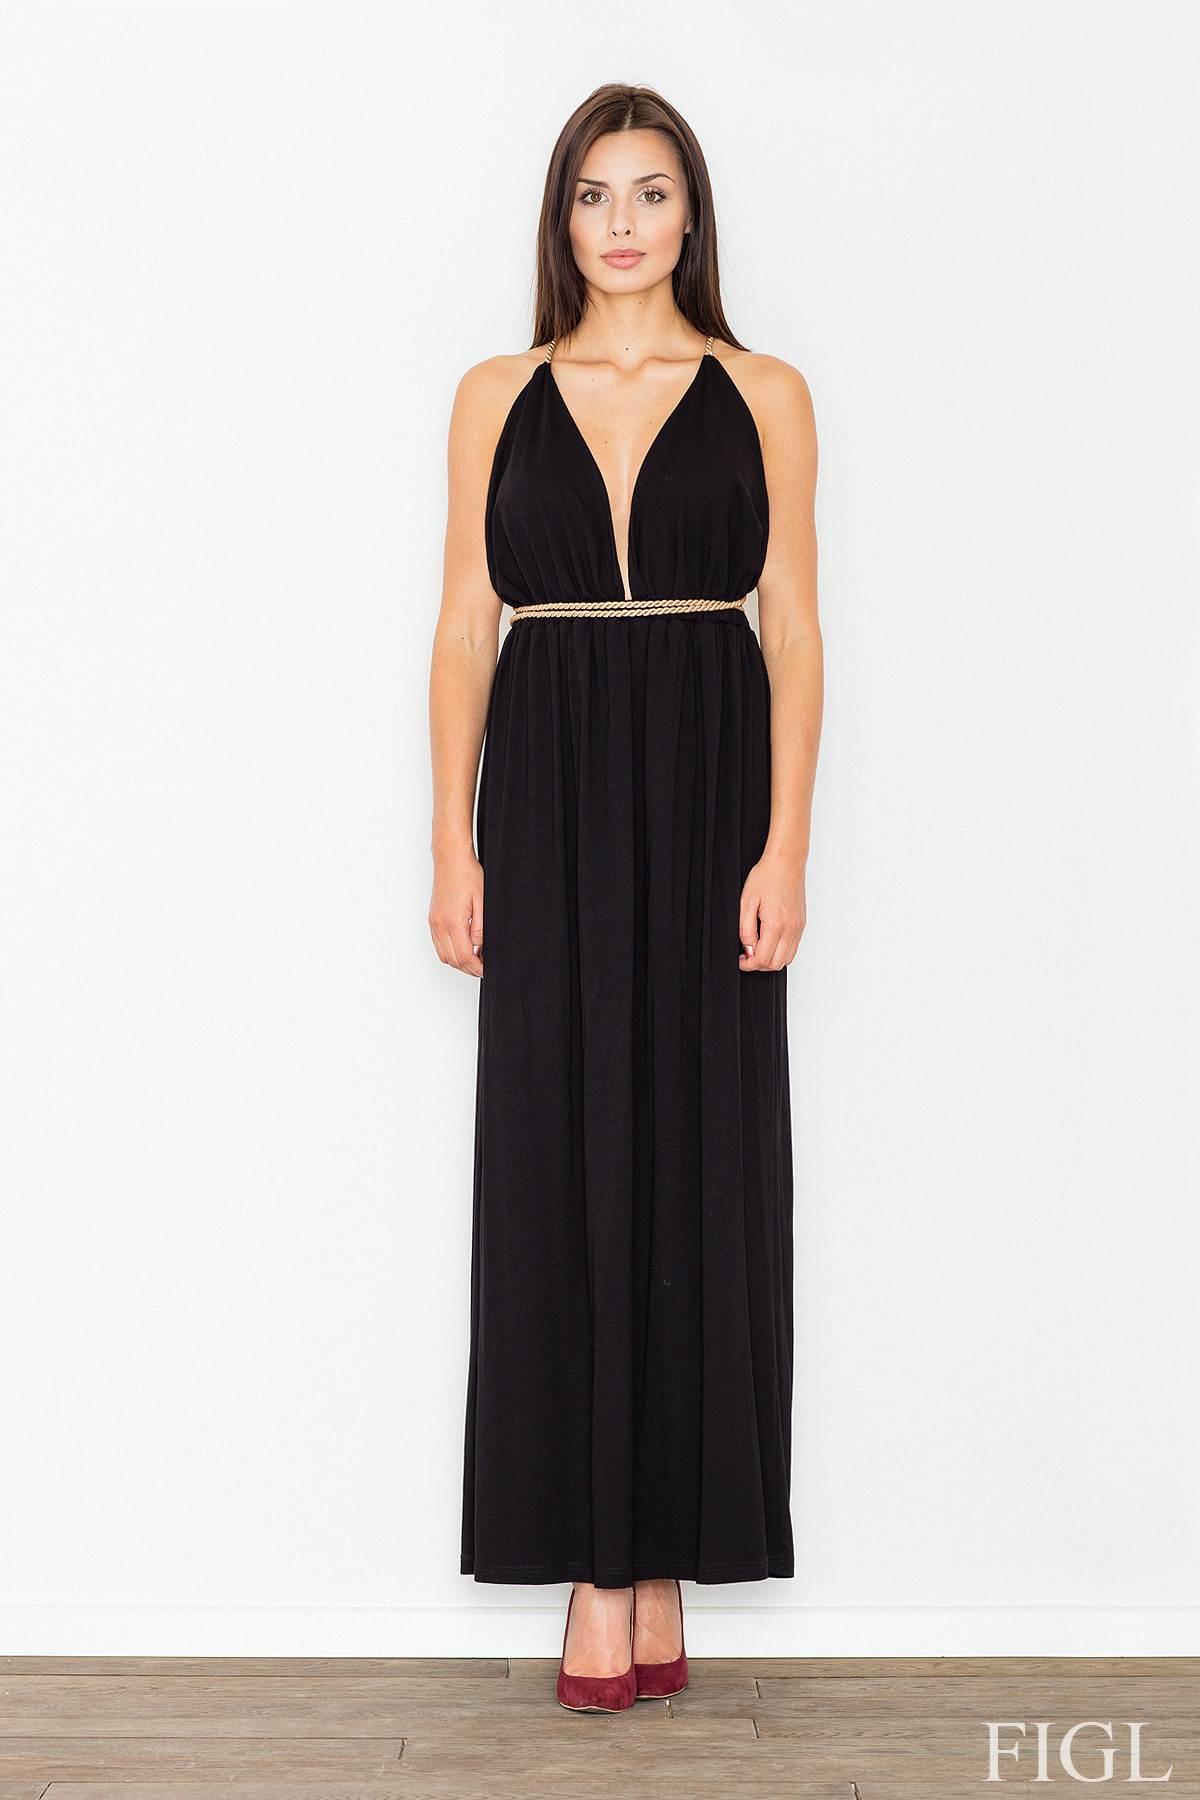 FIGL sexy maxi εξωπλατο φορεμα